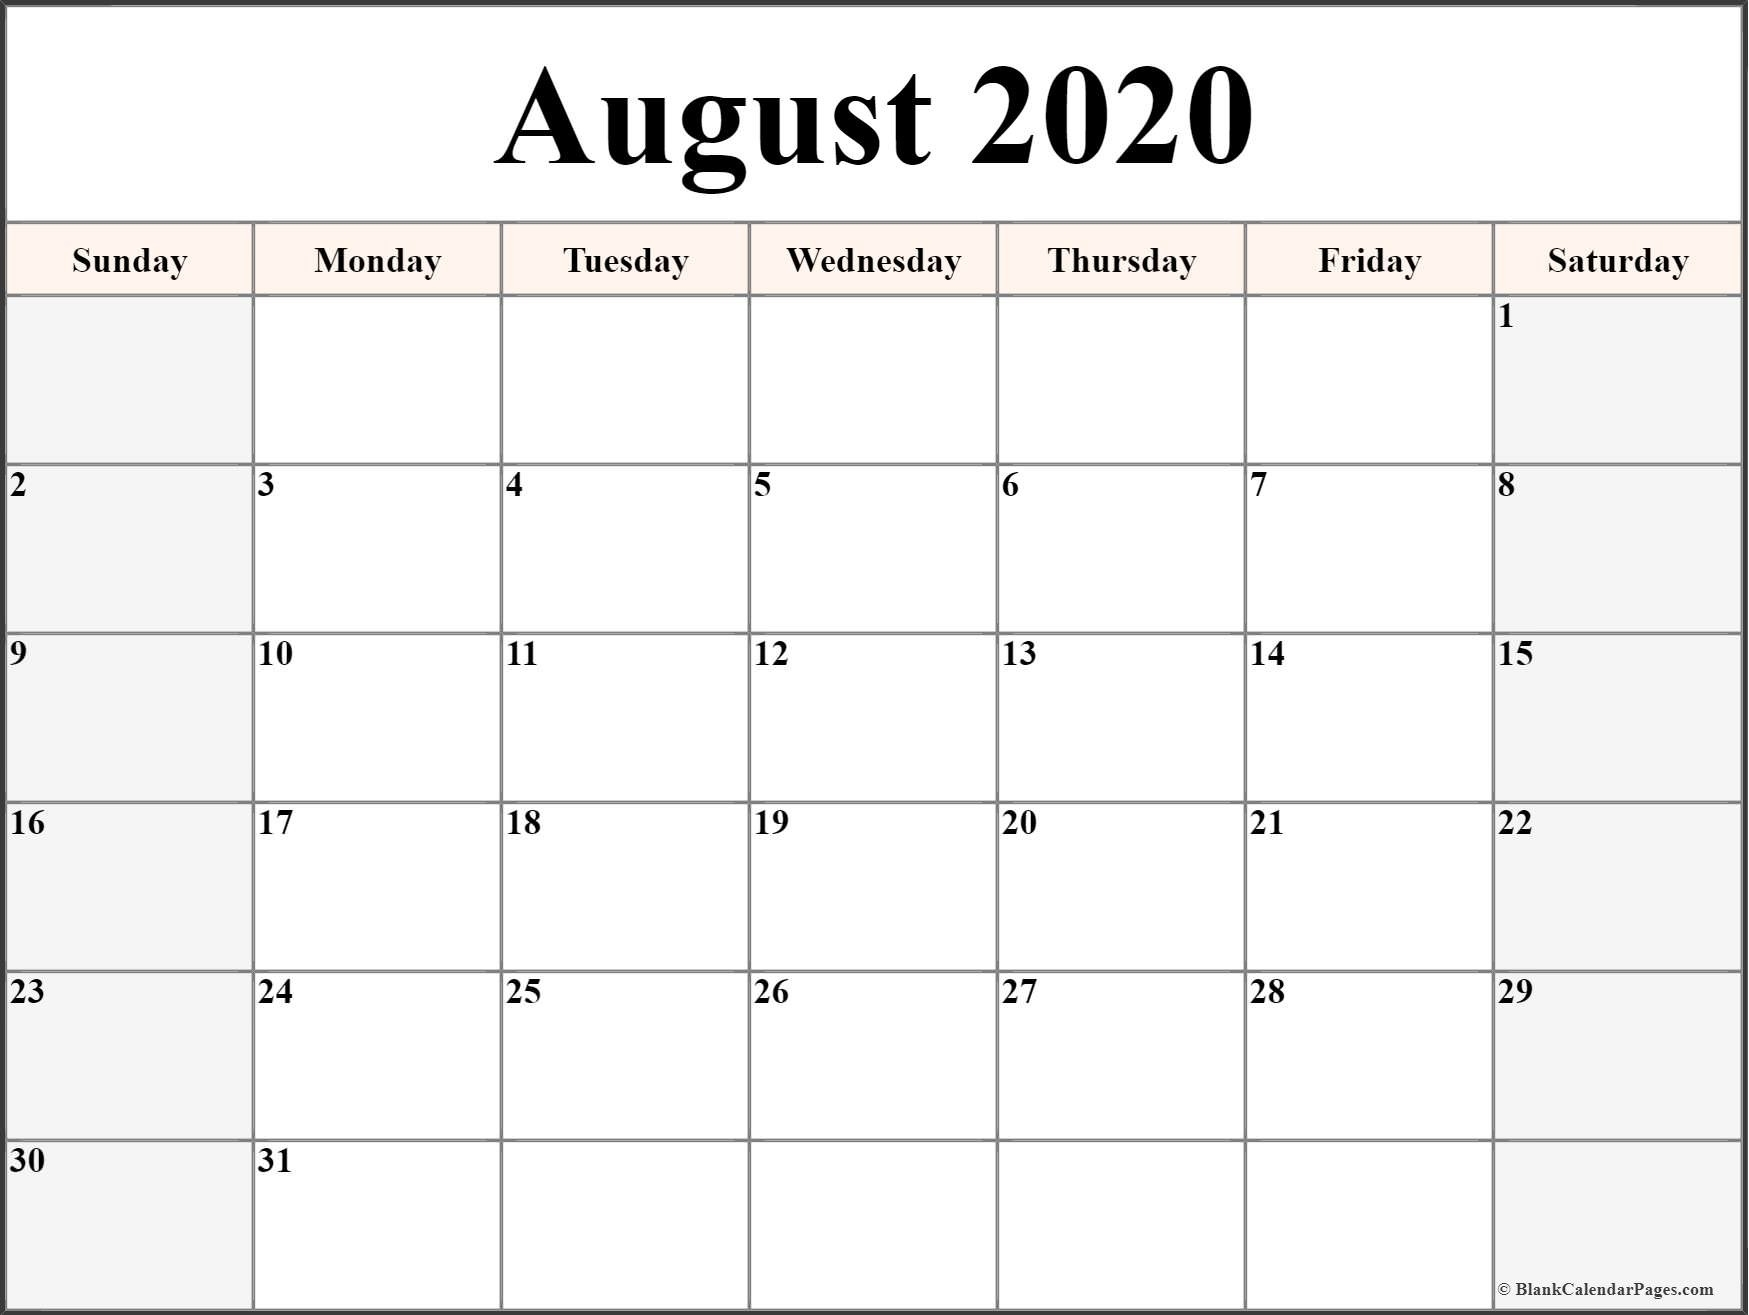 August 2020 Calendar | Free Printable Monthly Calendars-3 Month Blank Calendar June-August 2020